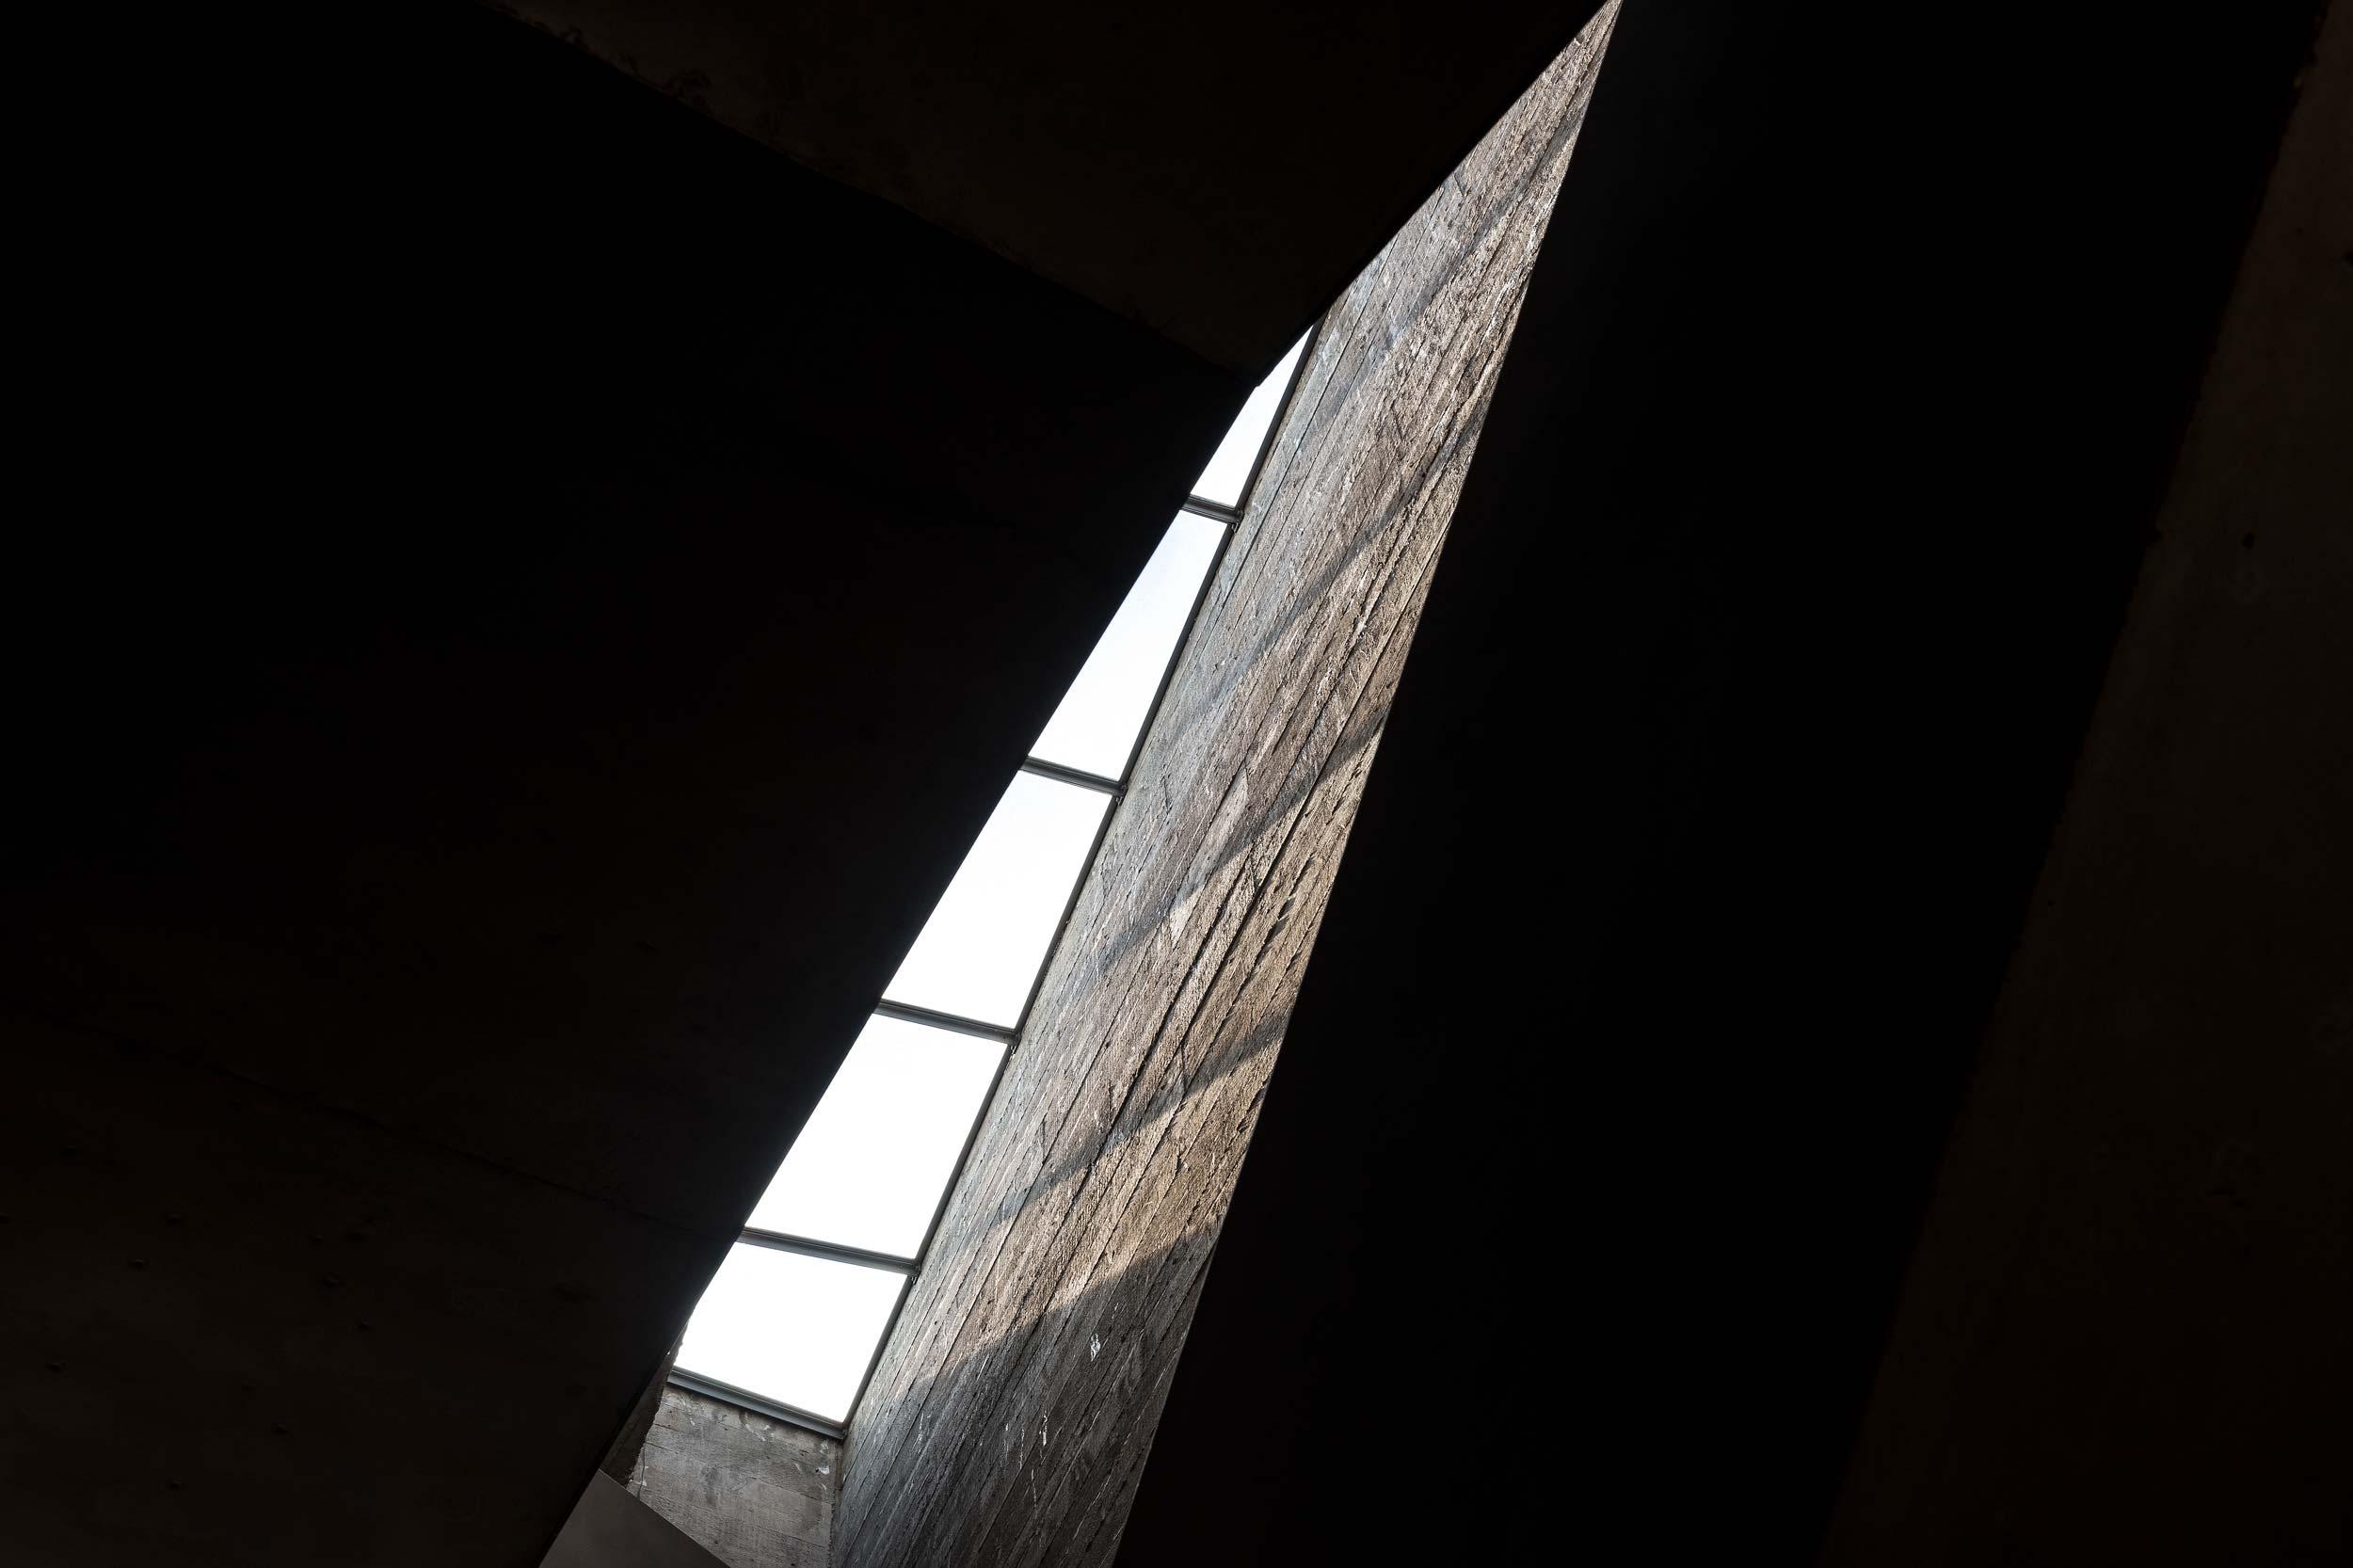 Holy Redeemer Church - Tenerife, Spanje - Interieur fotograaf Chiel de Nooyer